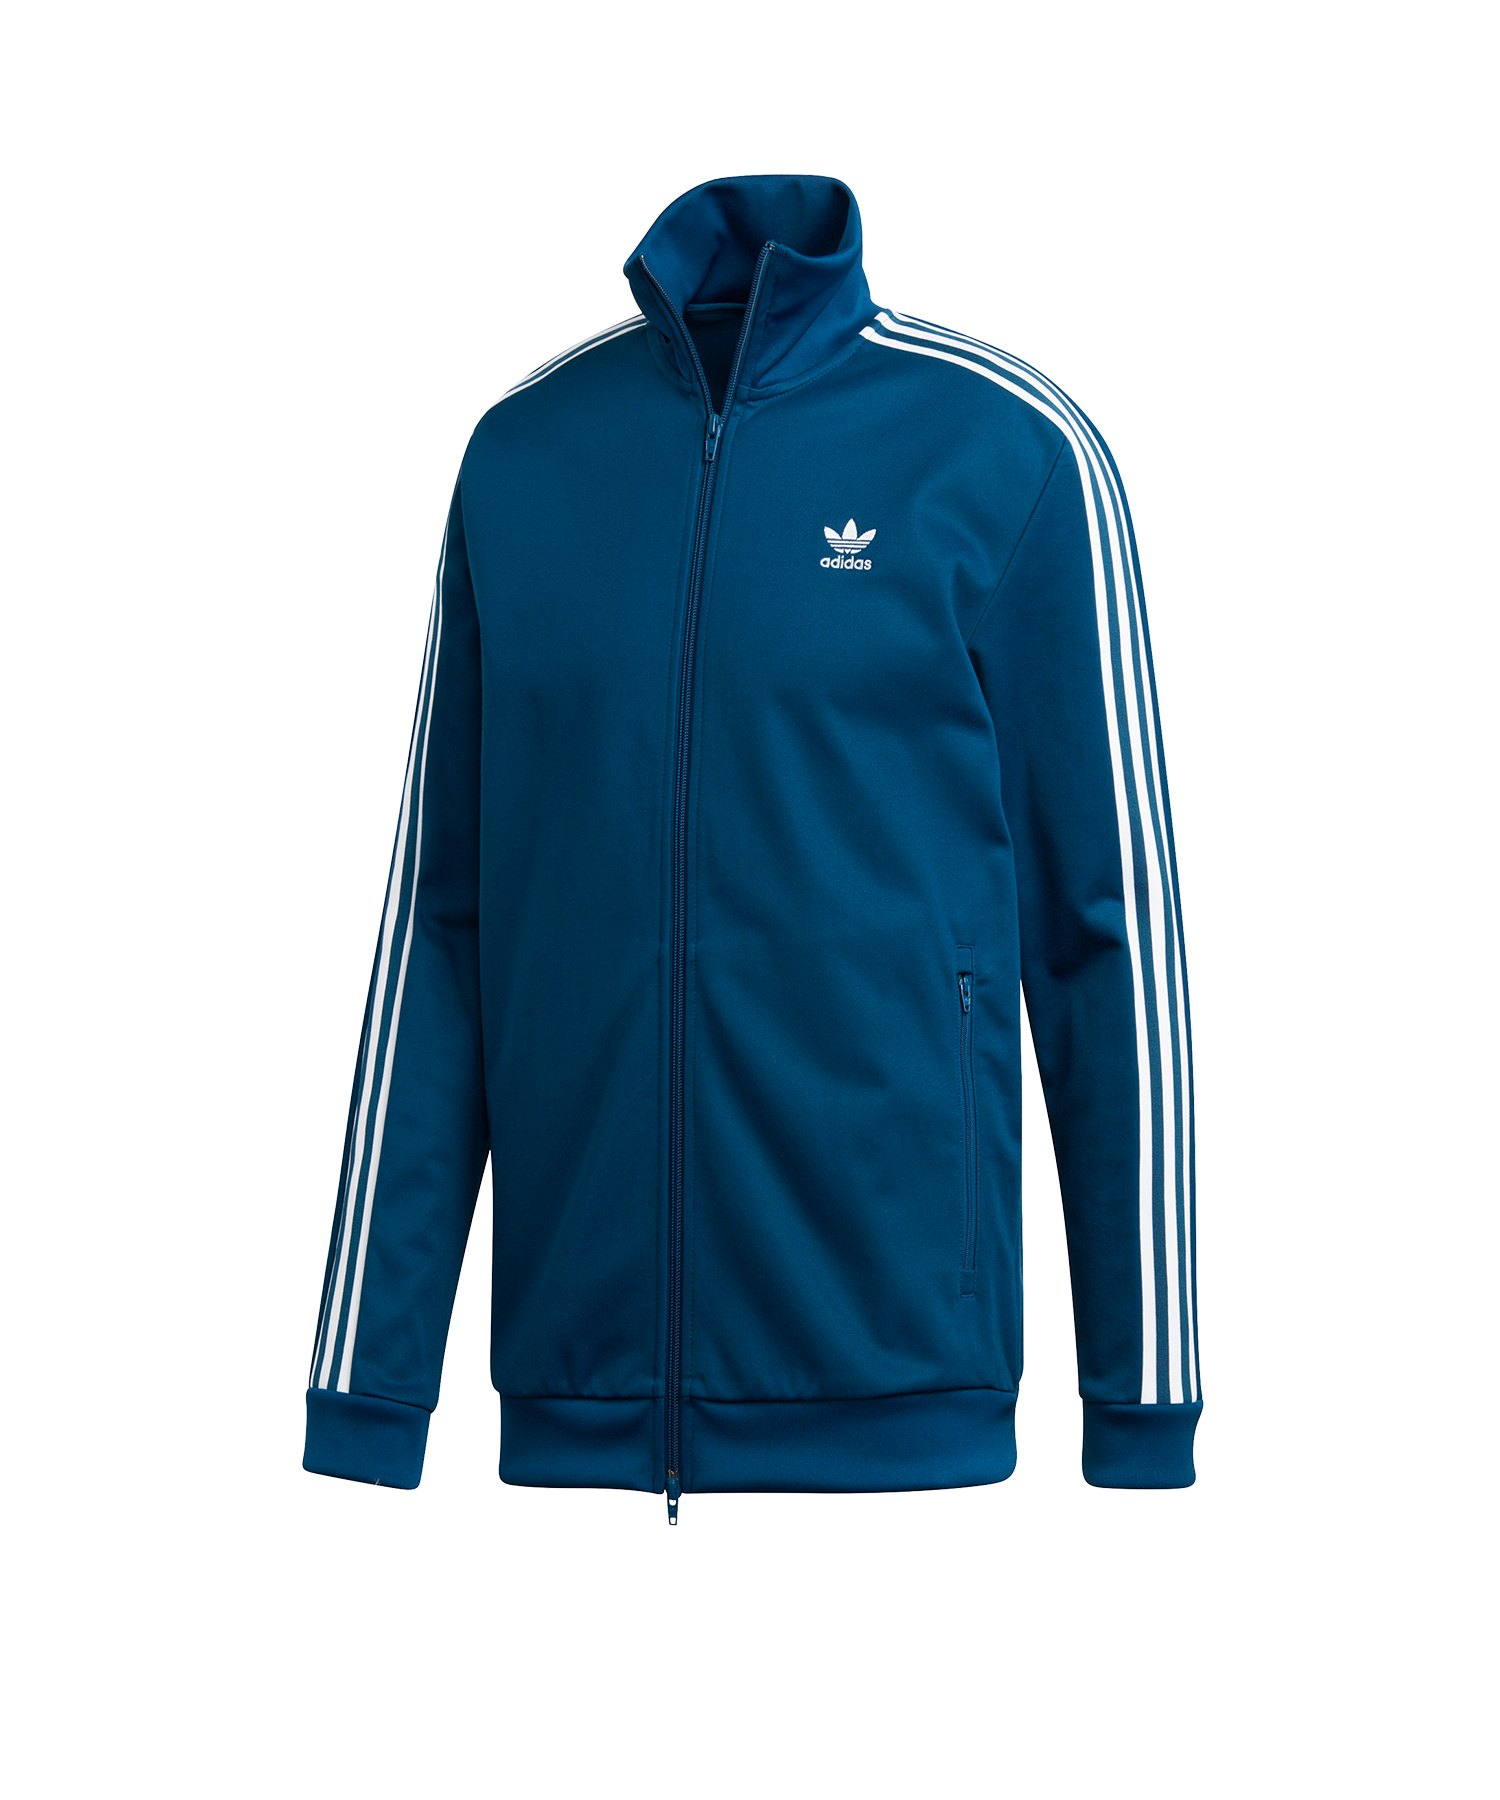 adidas Originals Beckenbauer Tracktop Blau